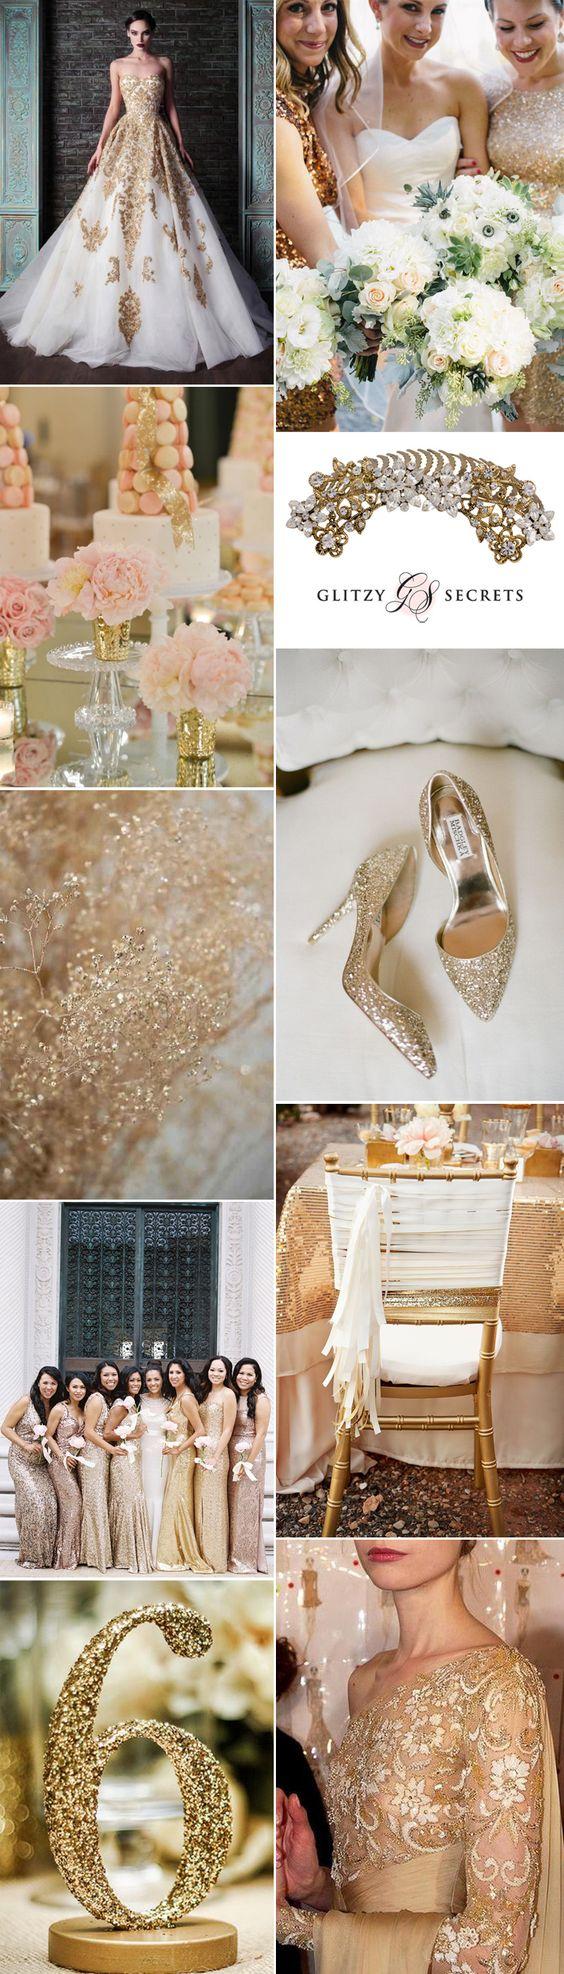 Explore Glitzy Secrets' decadent gold wedding ideas on GS Inspiration today